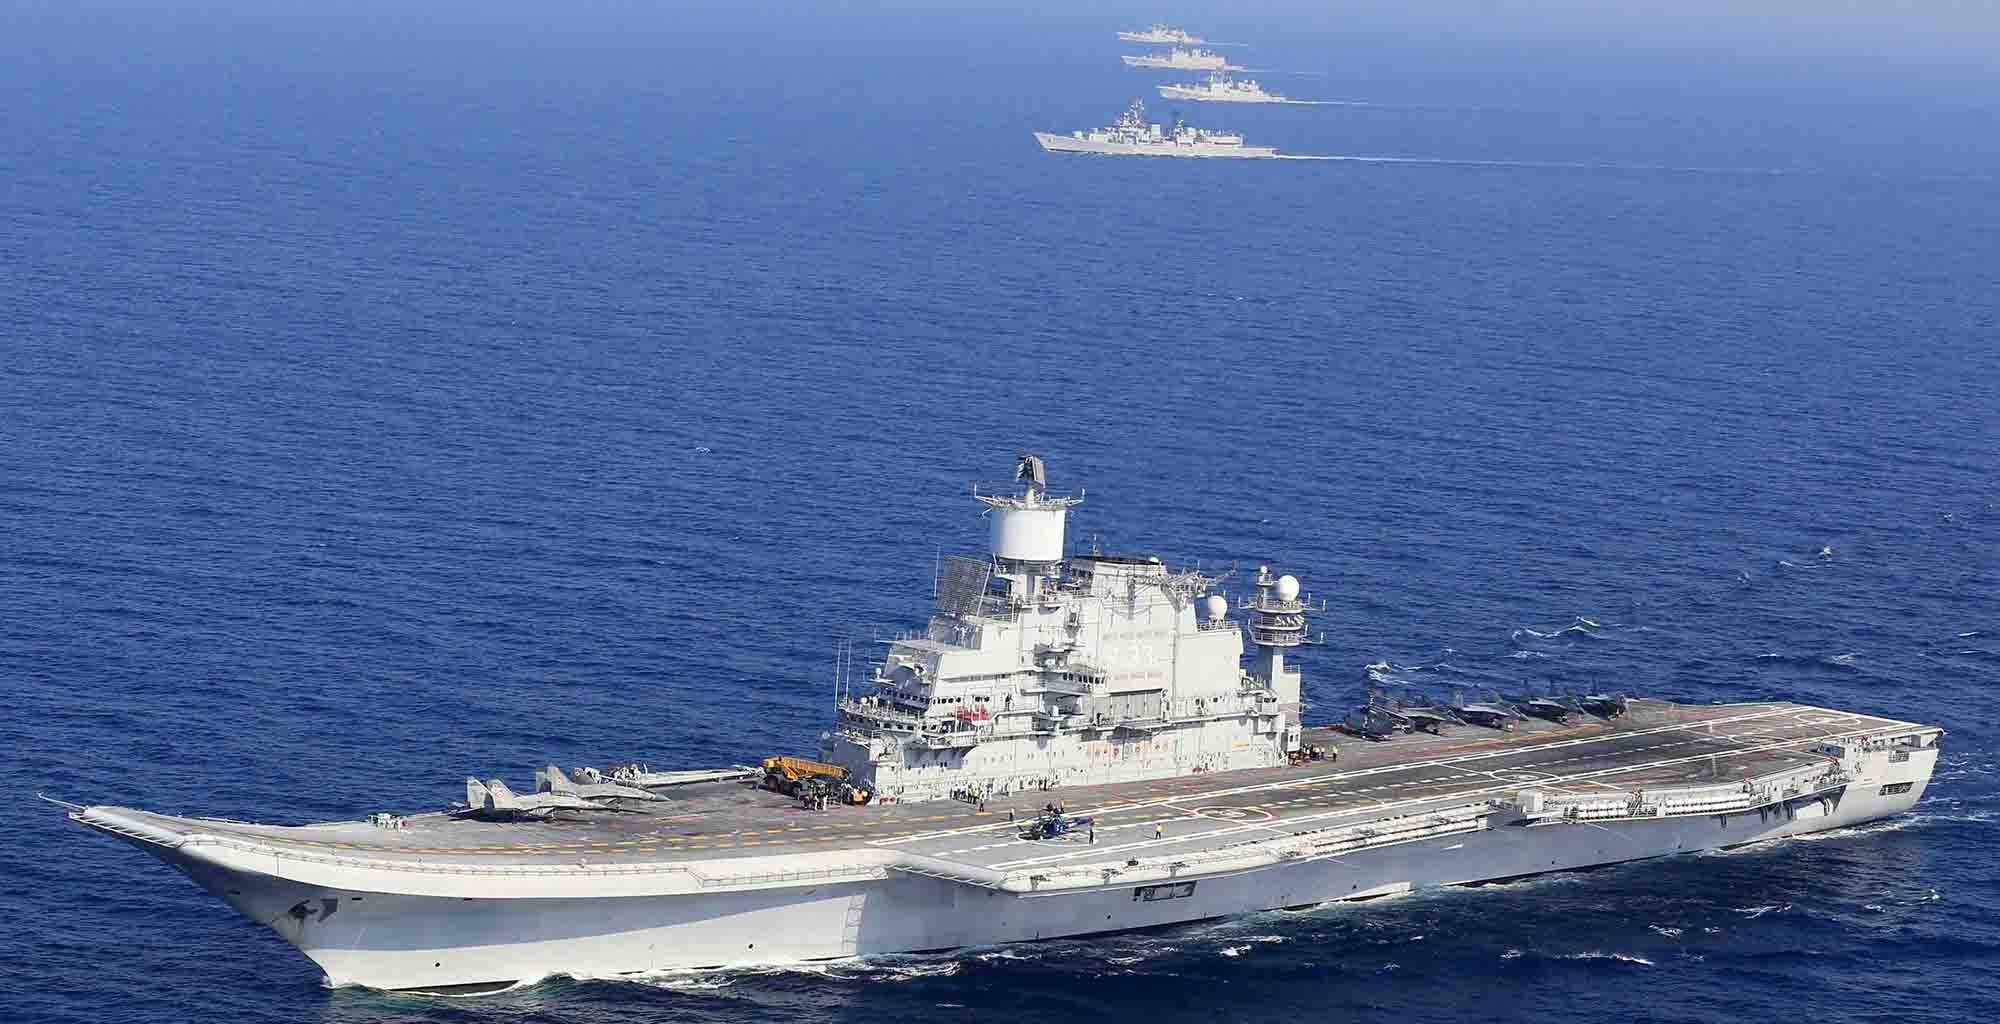 Vikramaditya liderando força-tarefa indiana